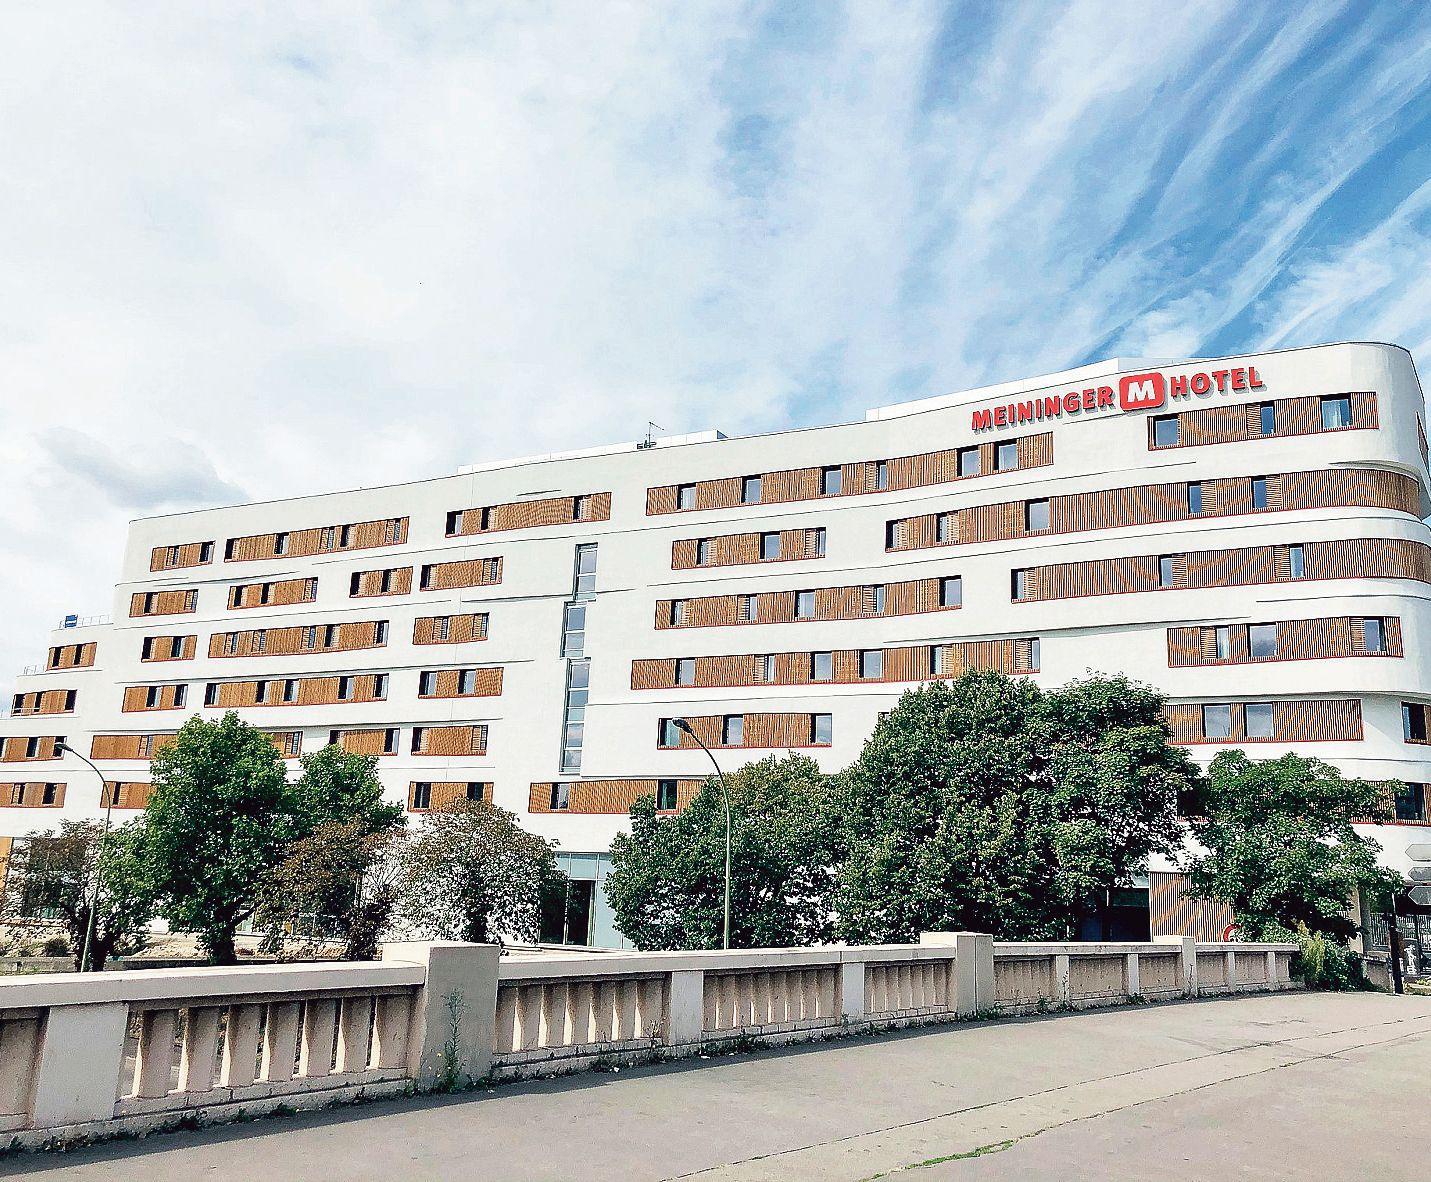 Hôtellerie: Paris attire les investisseurs